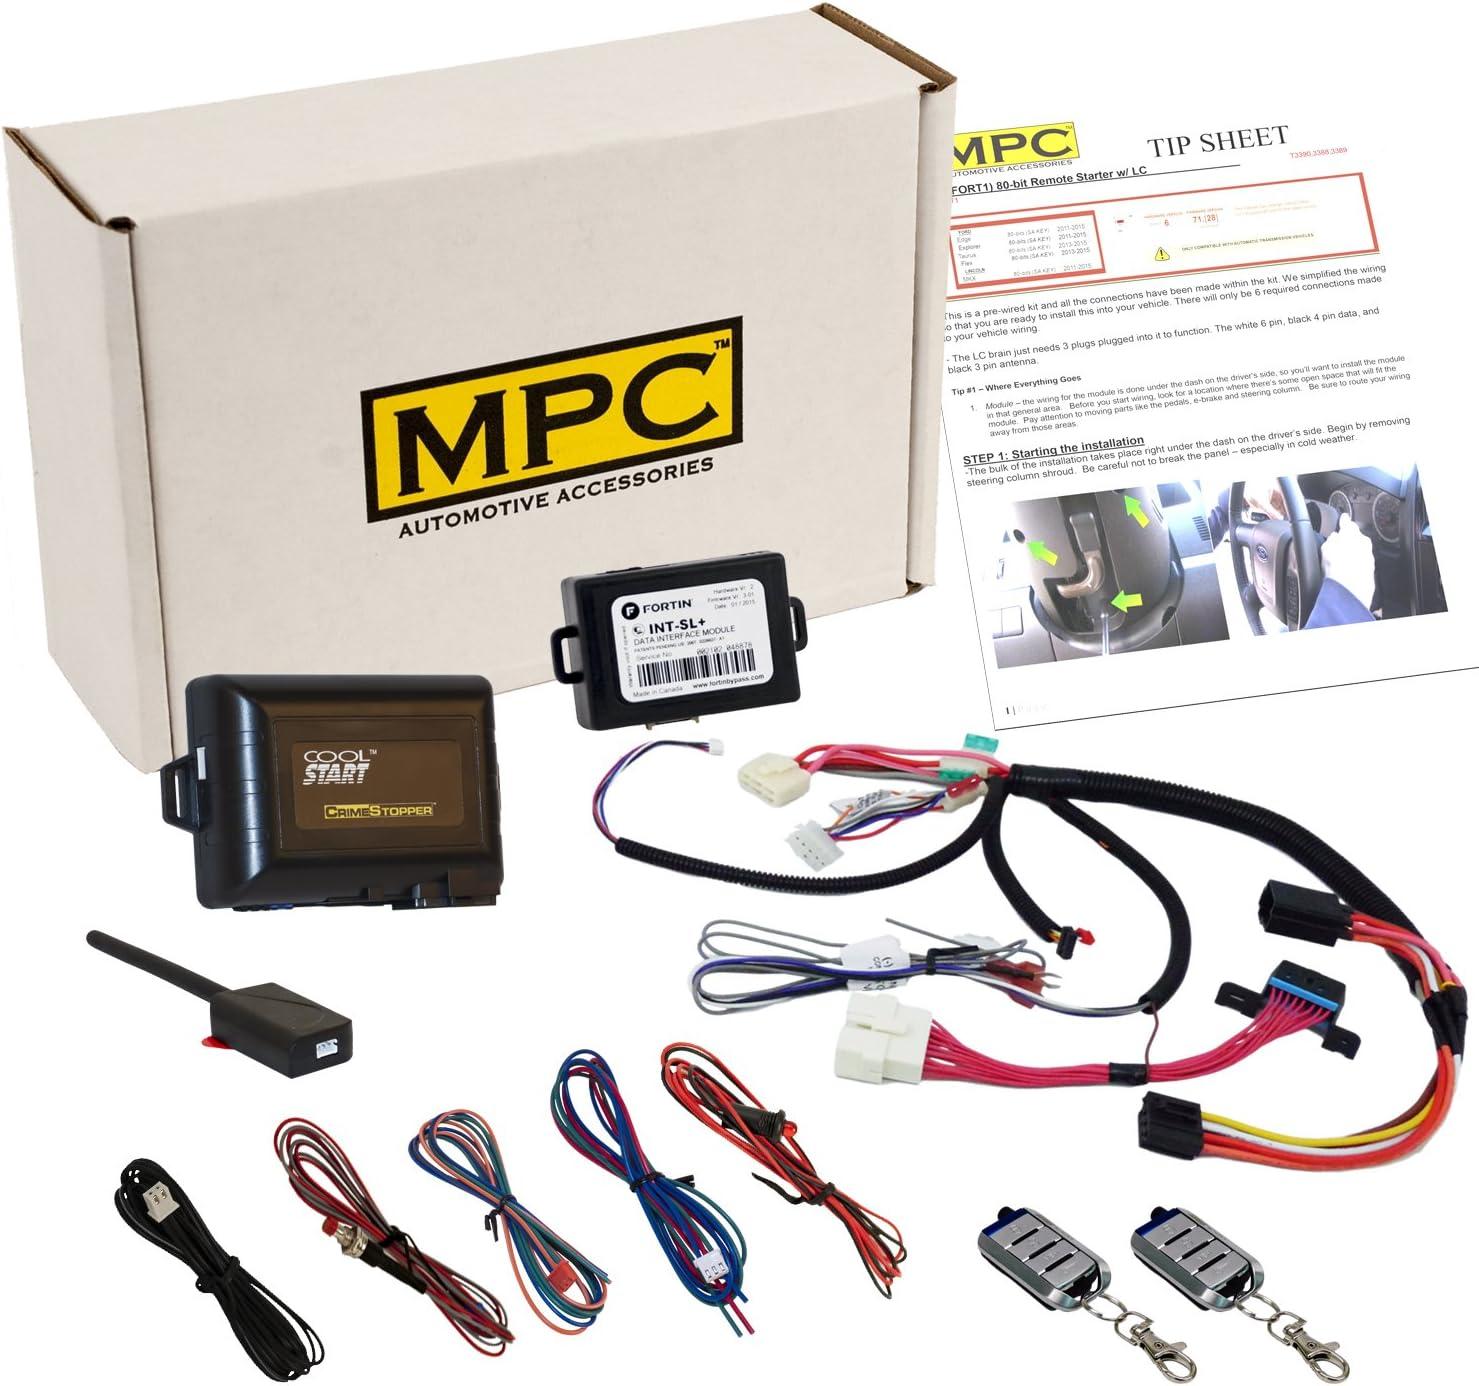 Amazon Com Mpc Plug N Play Remote Start Keyless Entry Kit For Sierra Silverado 2003 2007 Classic Prewired T Harness Firmware Preloaded Simple Installation Automotive